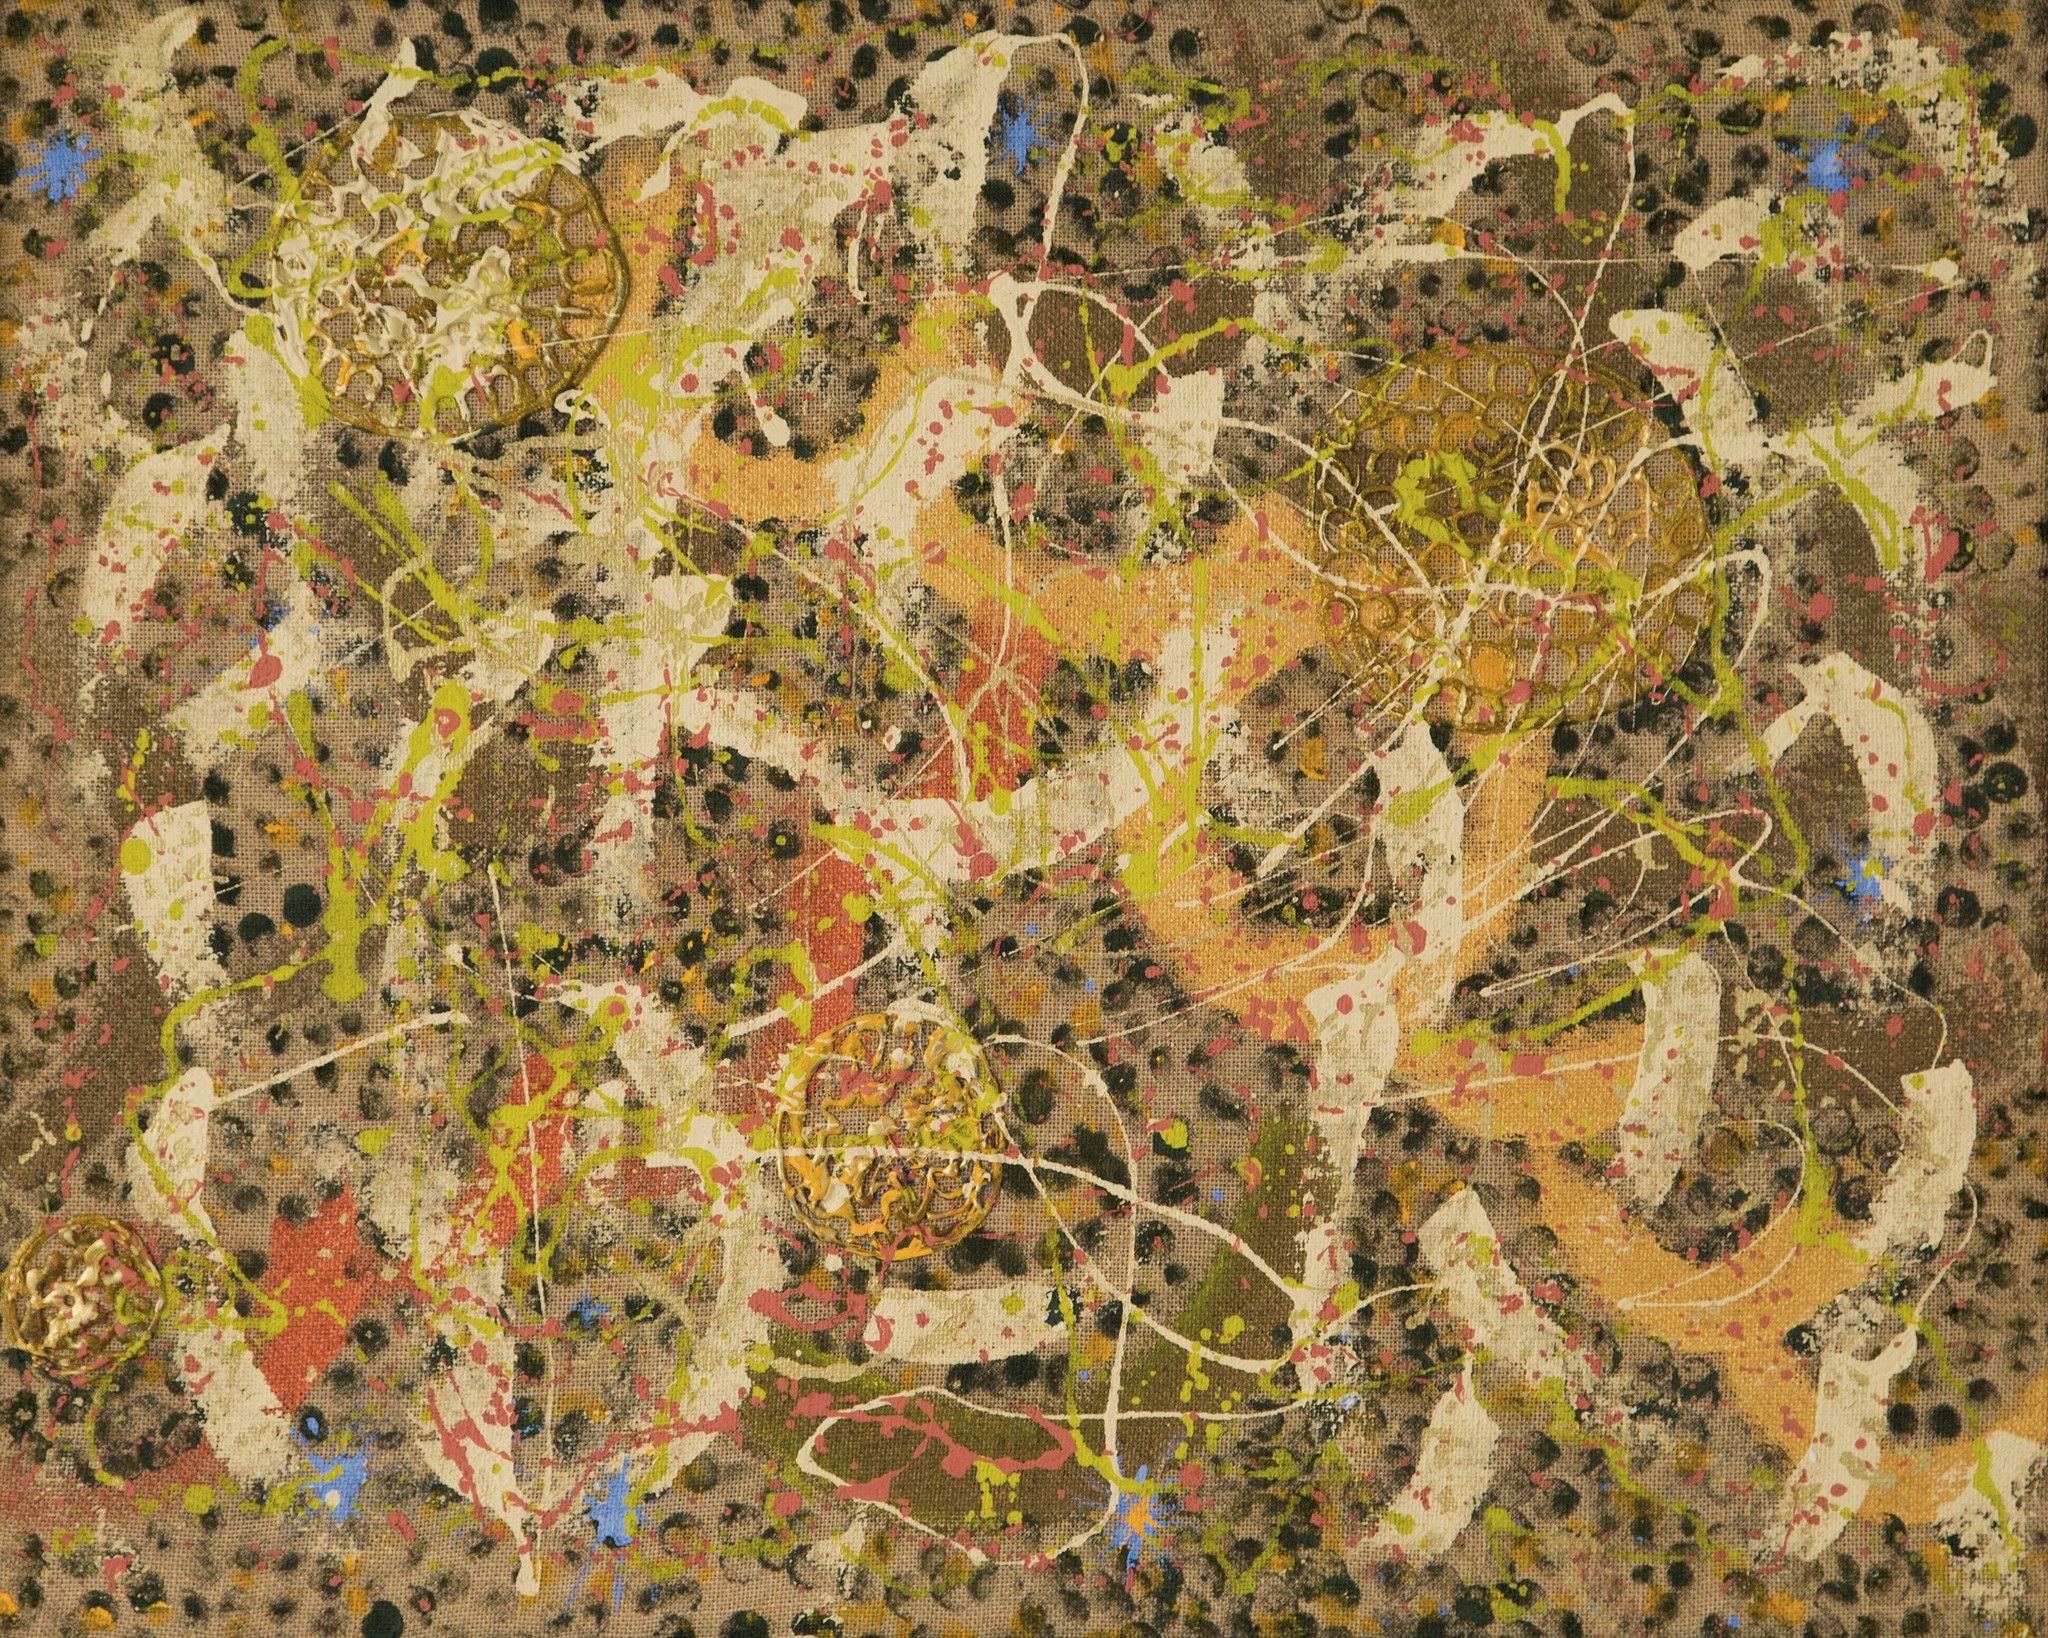 MIXED  MEDIA SU JUTA FEOFEO 'HAREM' dimensioni L 95 x H 76 cm.